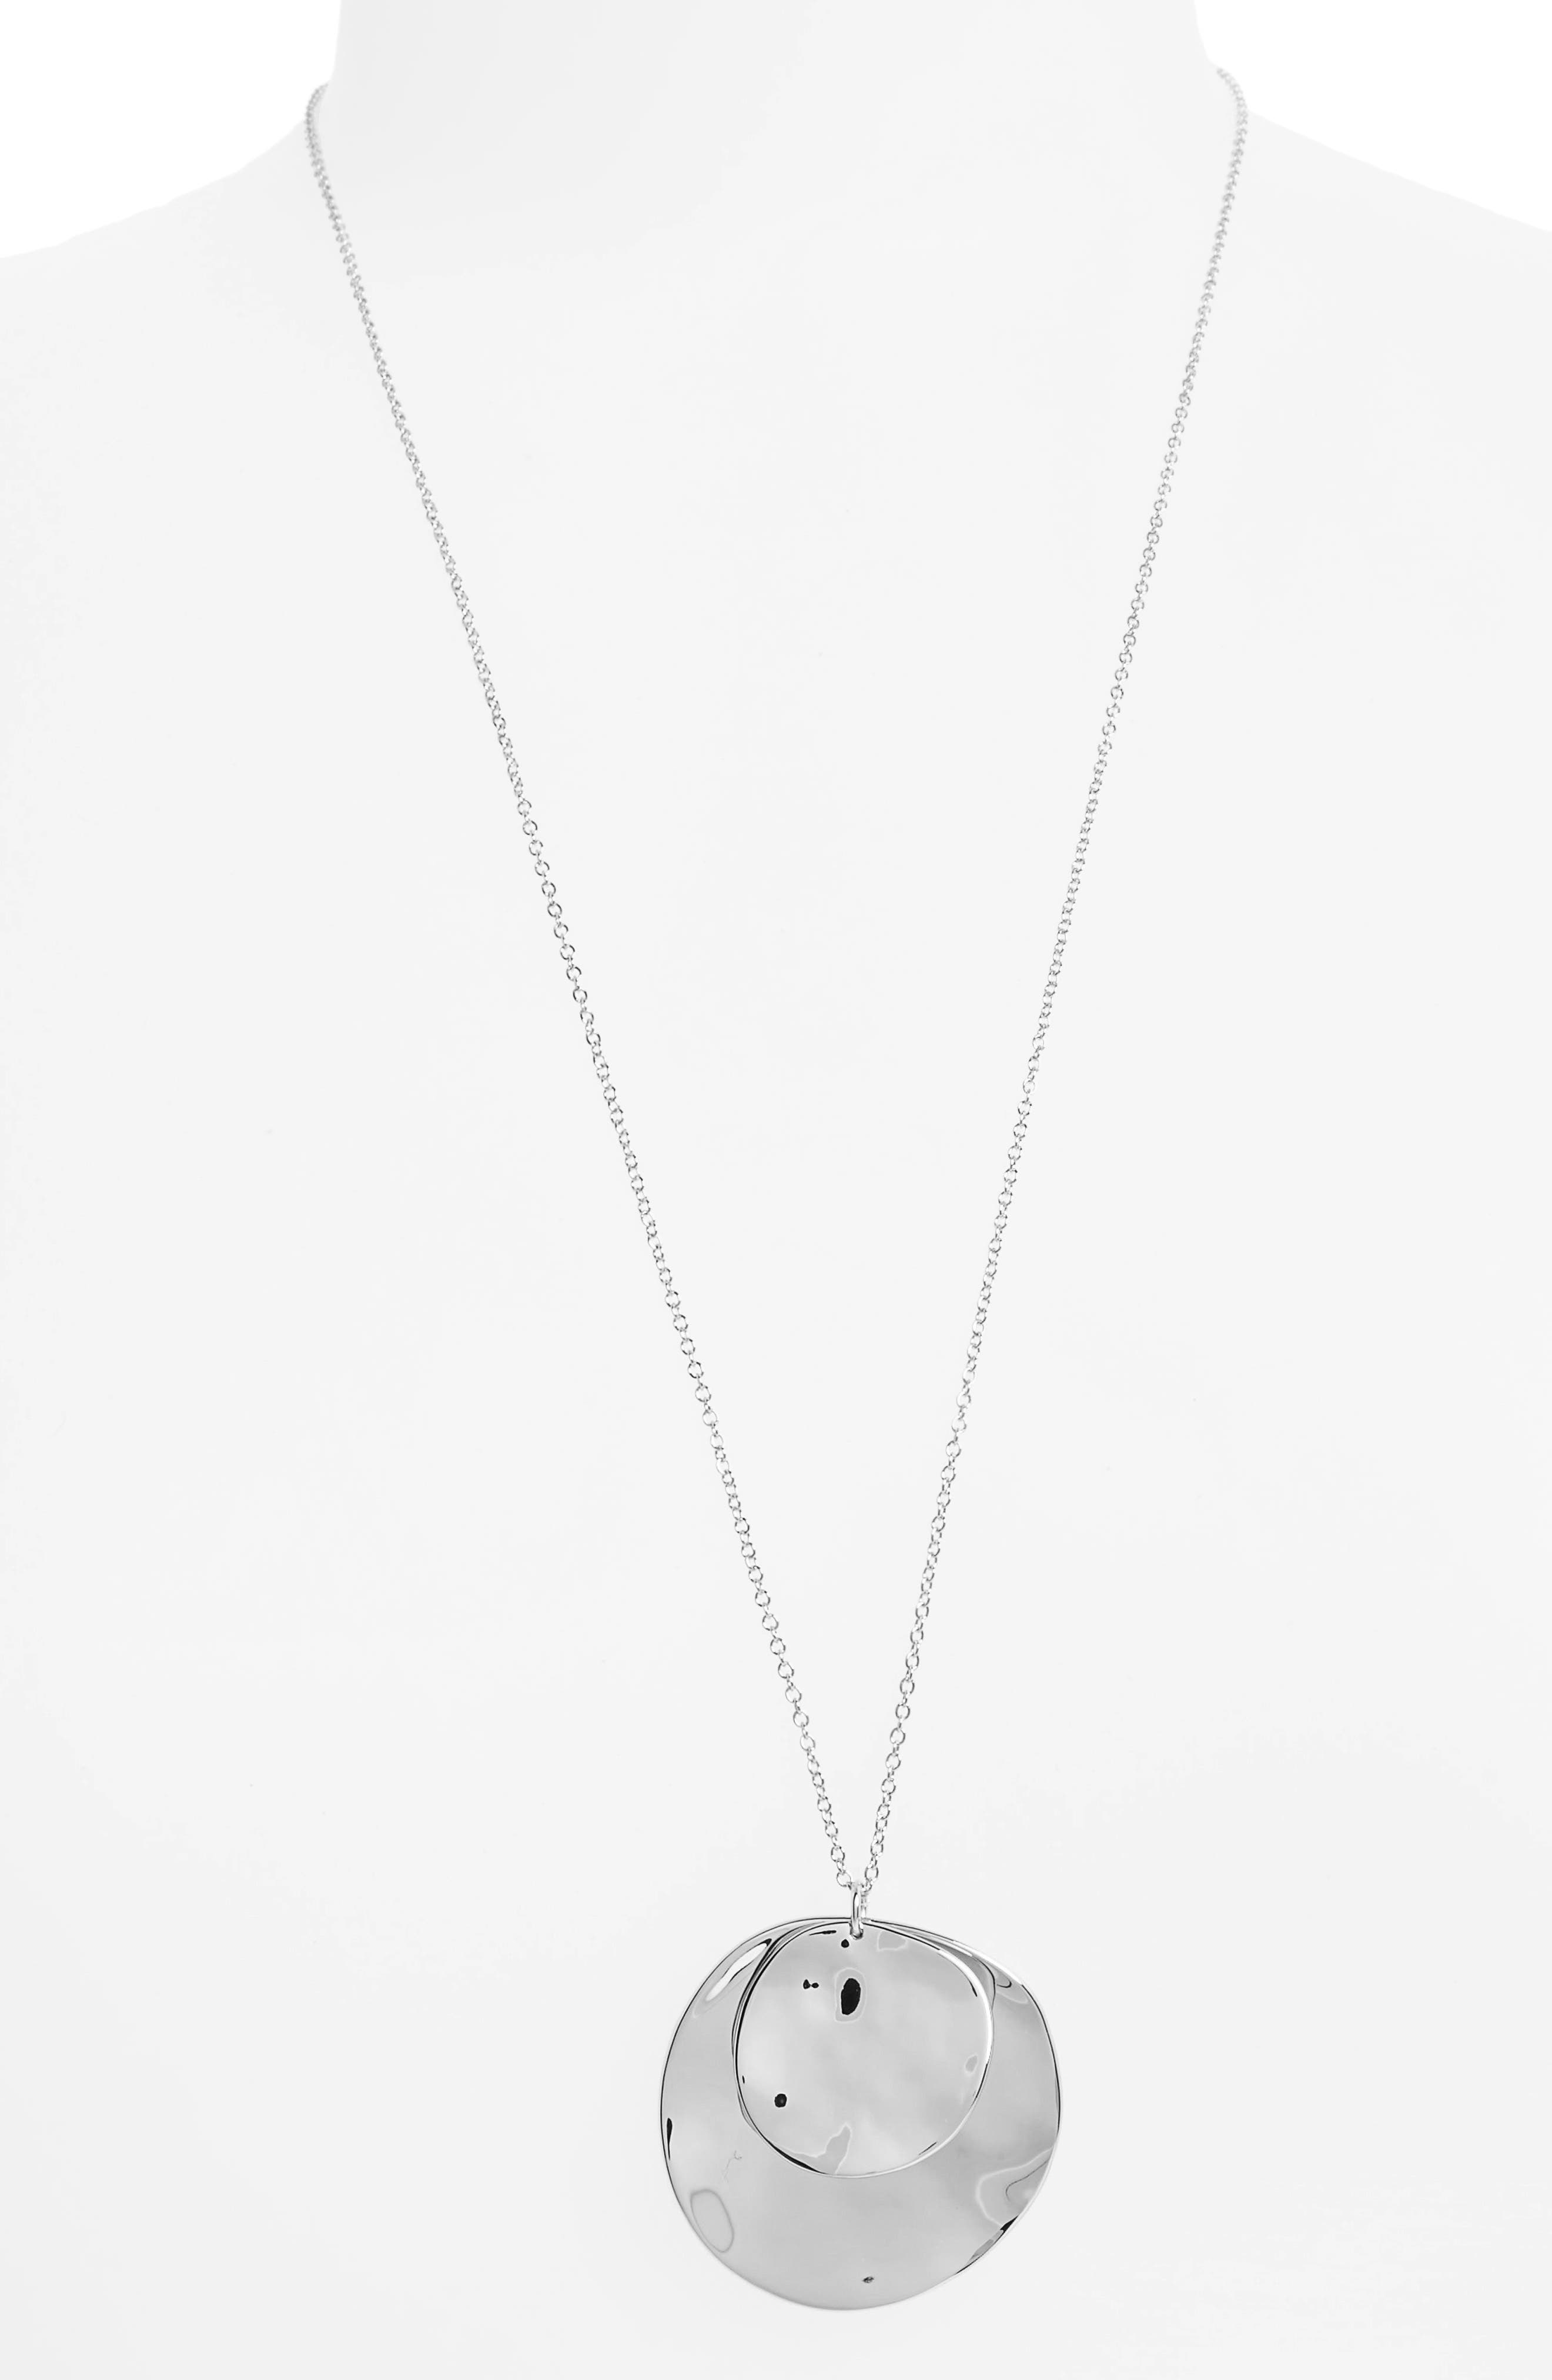 Chloe Long Cluster Pendant Necklace,                             Main thumbnail 1, color,                             Silver